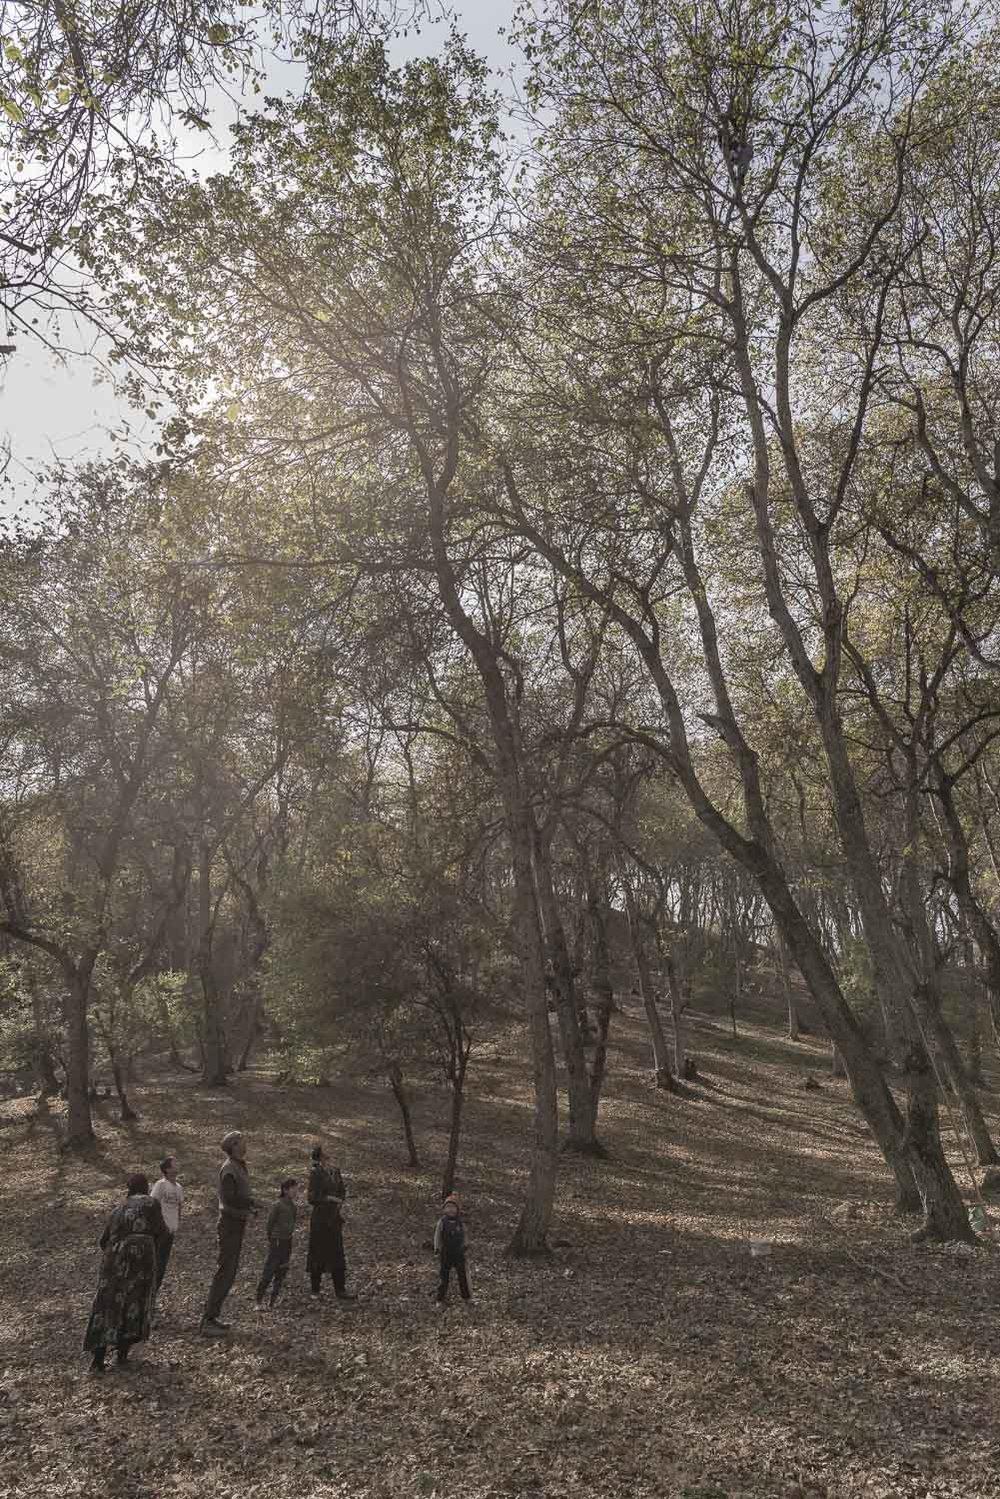 arslanbob-walnut-picking-shaking-trees-kyrgyzstan-jo-kearney-photography-video.jpg